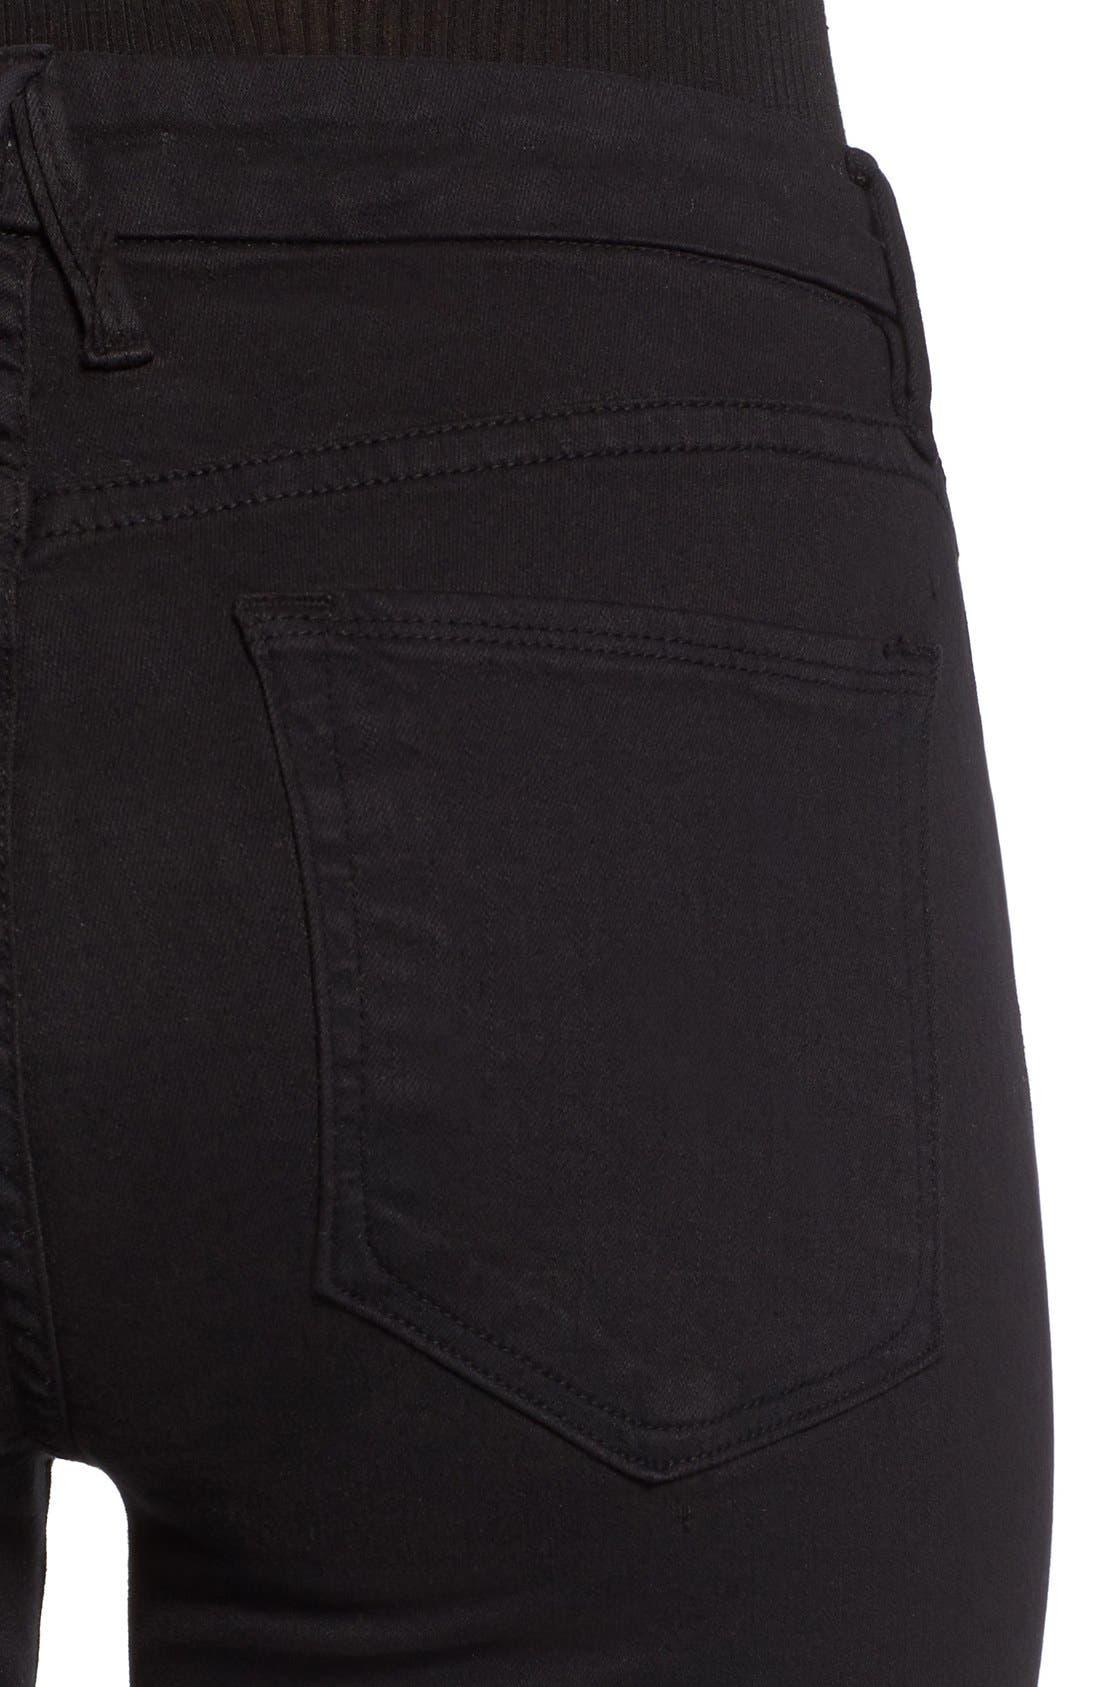 Alternate Image 4  - Good American Good Legs High Rise Ripped Skinny Jeans (Black 002)